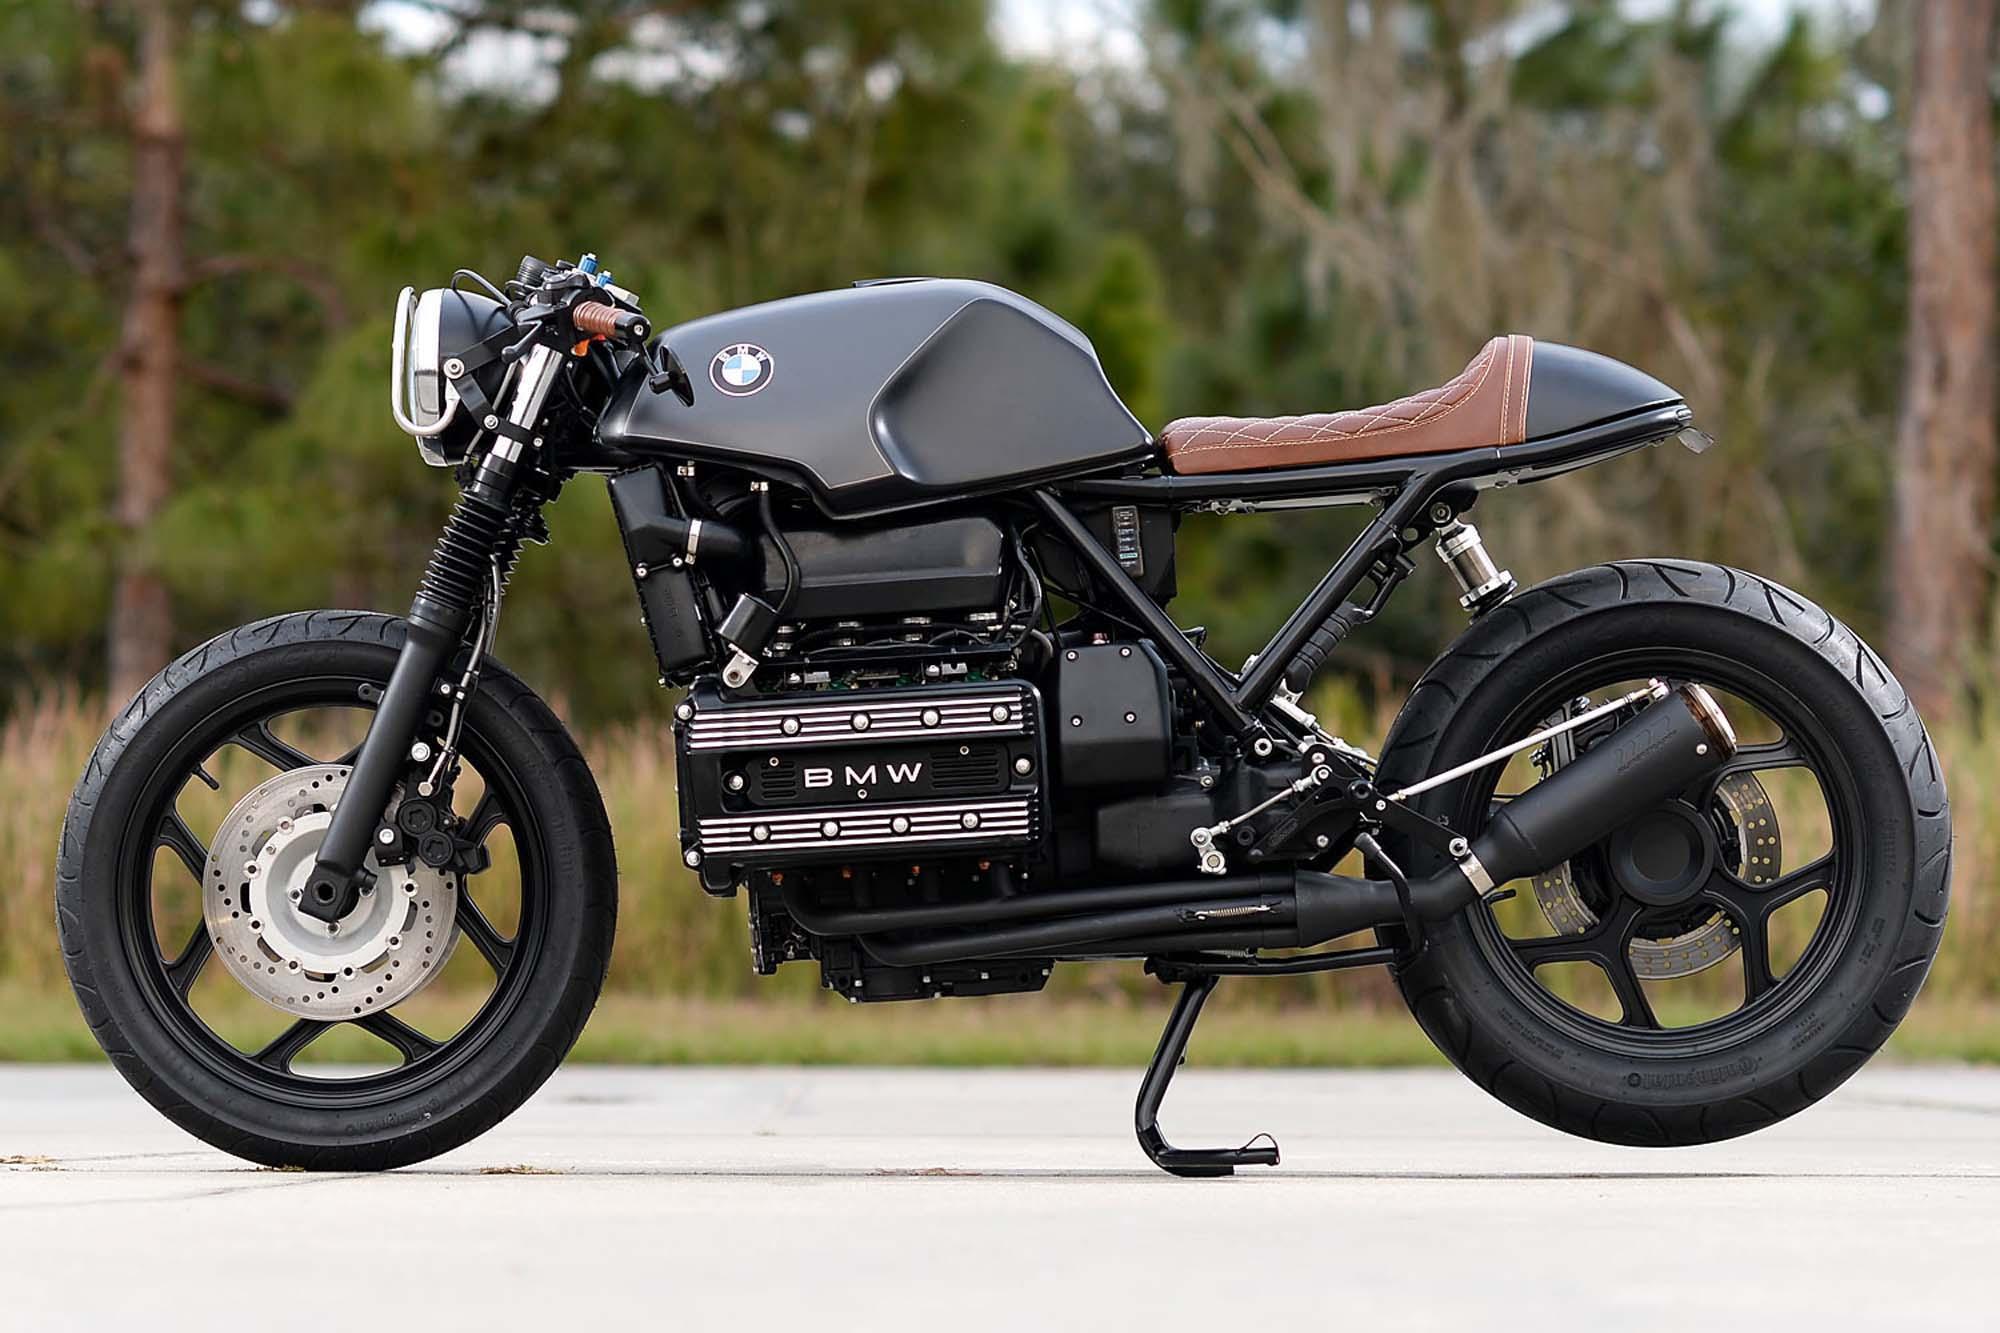 BMW K100RS Cafe Racer Umbau von Hageman Motorcycles Foto